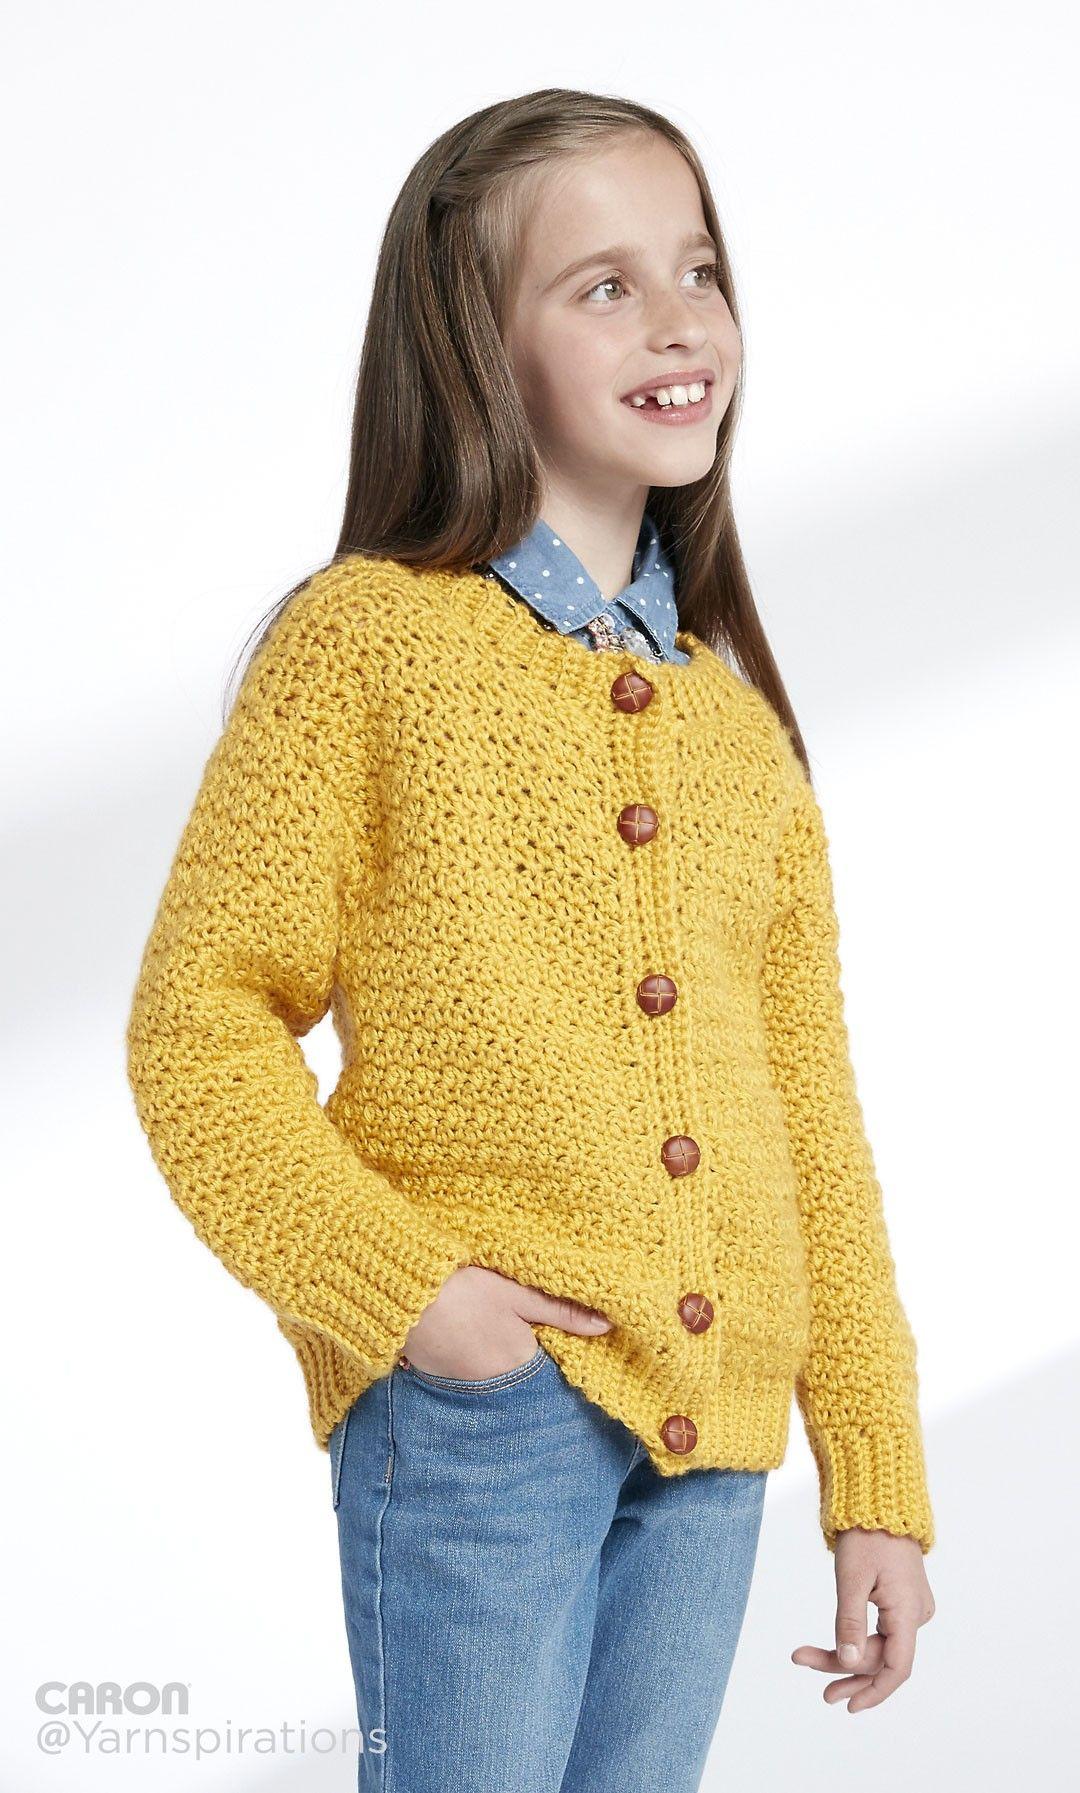 Childs crochet crew neck cardigan patterns yarnspirations sz ravelry childs crochet crew neck cardigan pattern by caron design team bankloansurffo Gallery